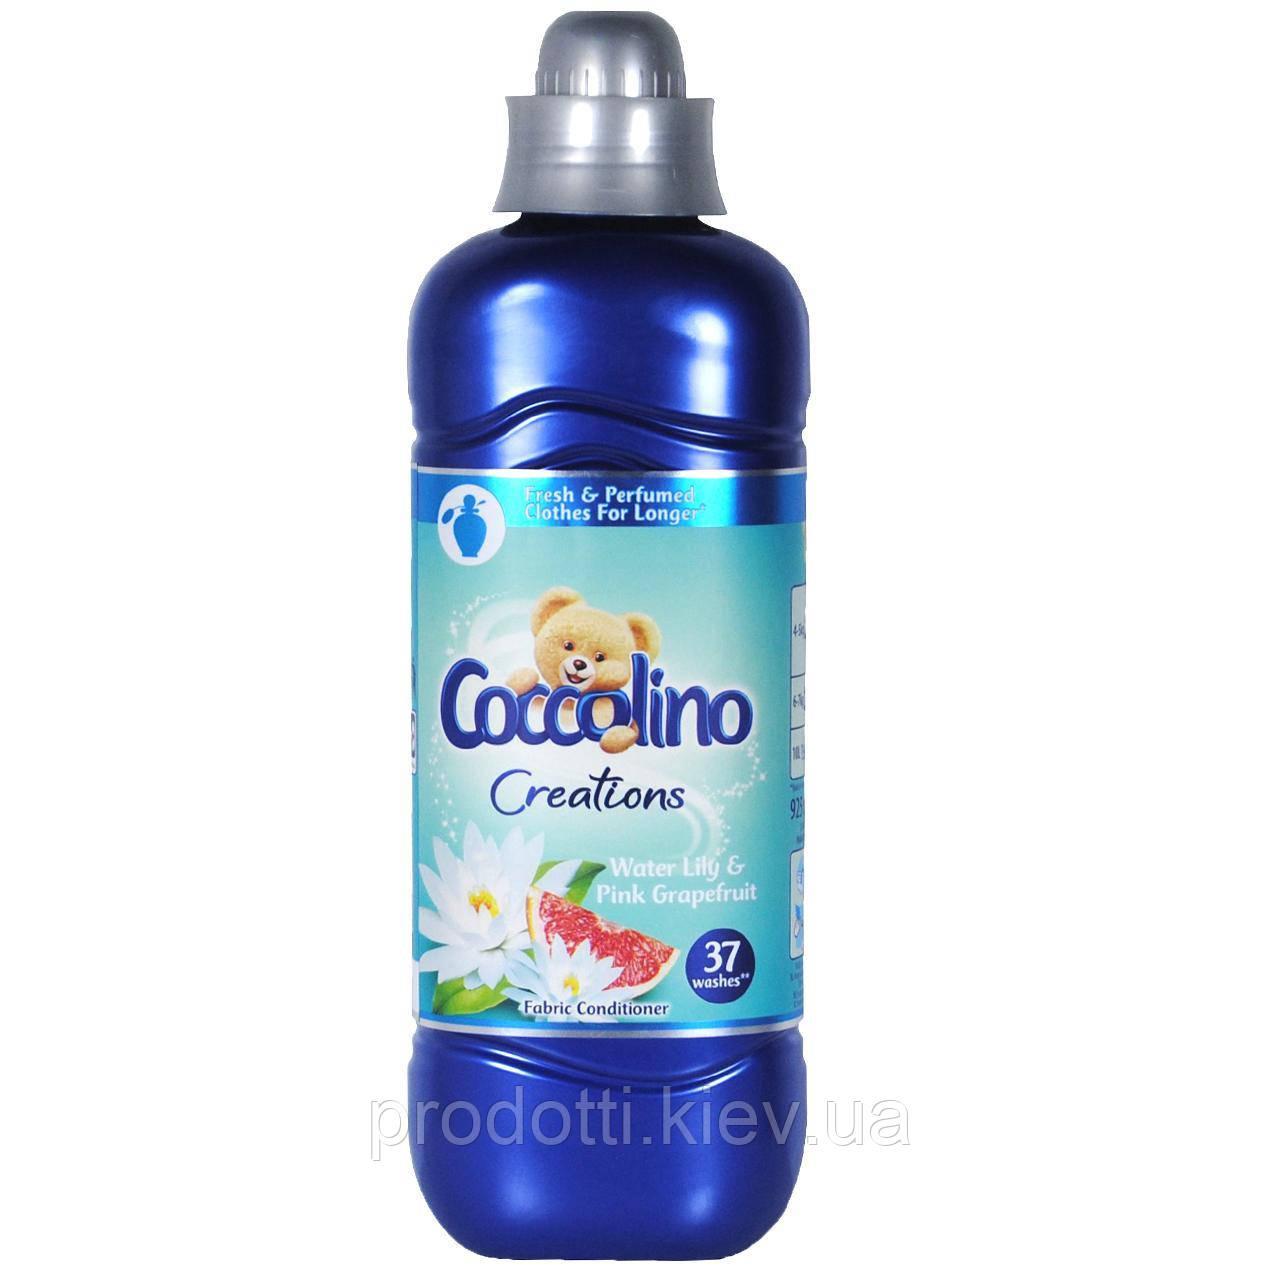 Coccolino Water Lily & Pink Grapefruit - ополіскувач для білизни 925 ml